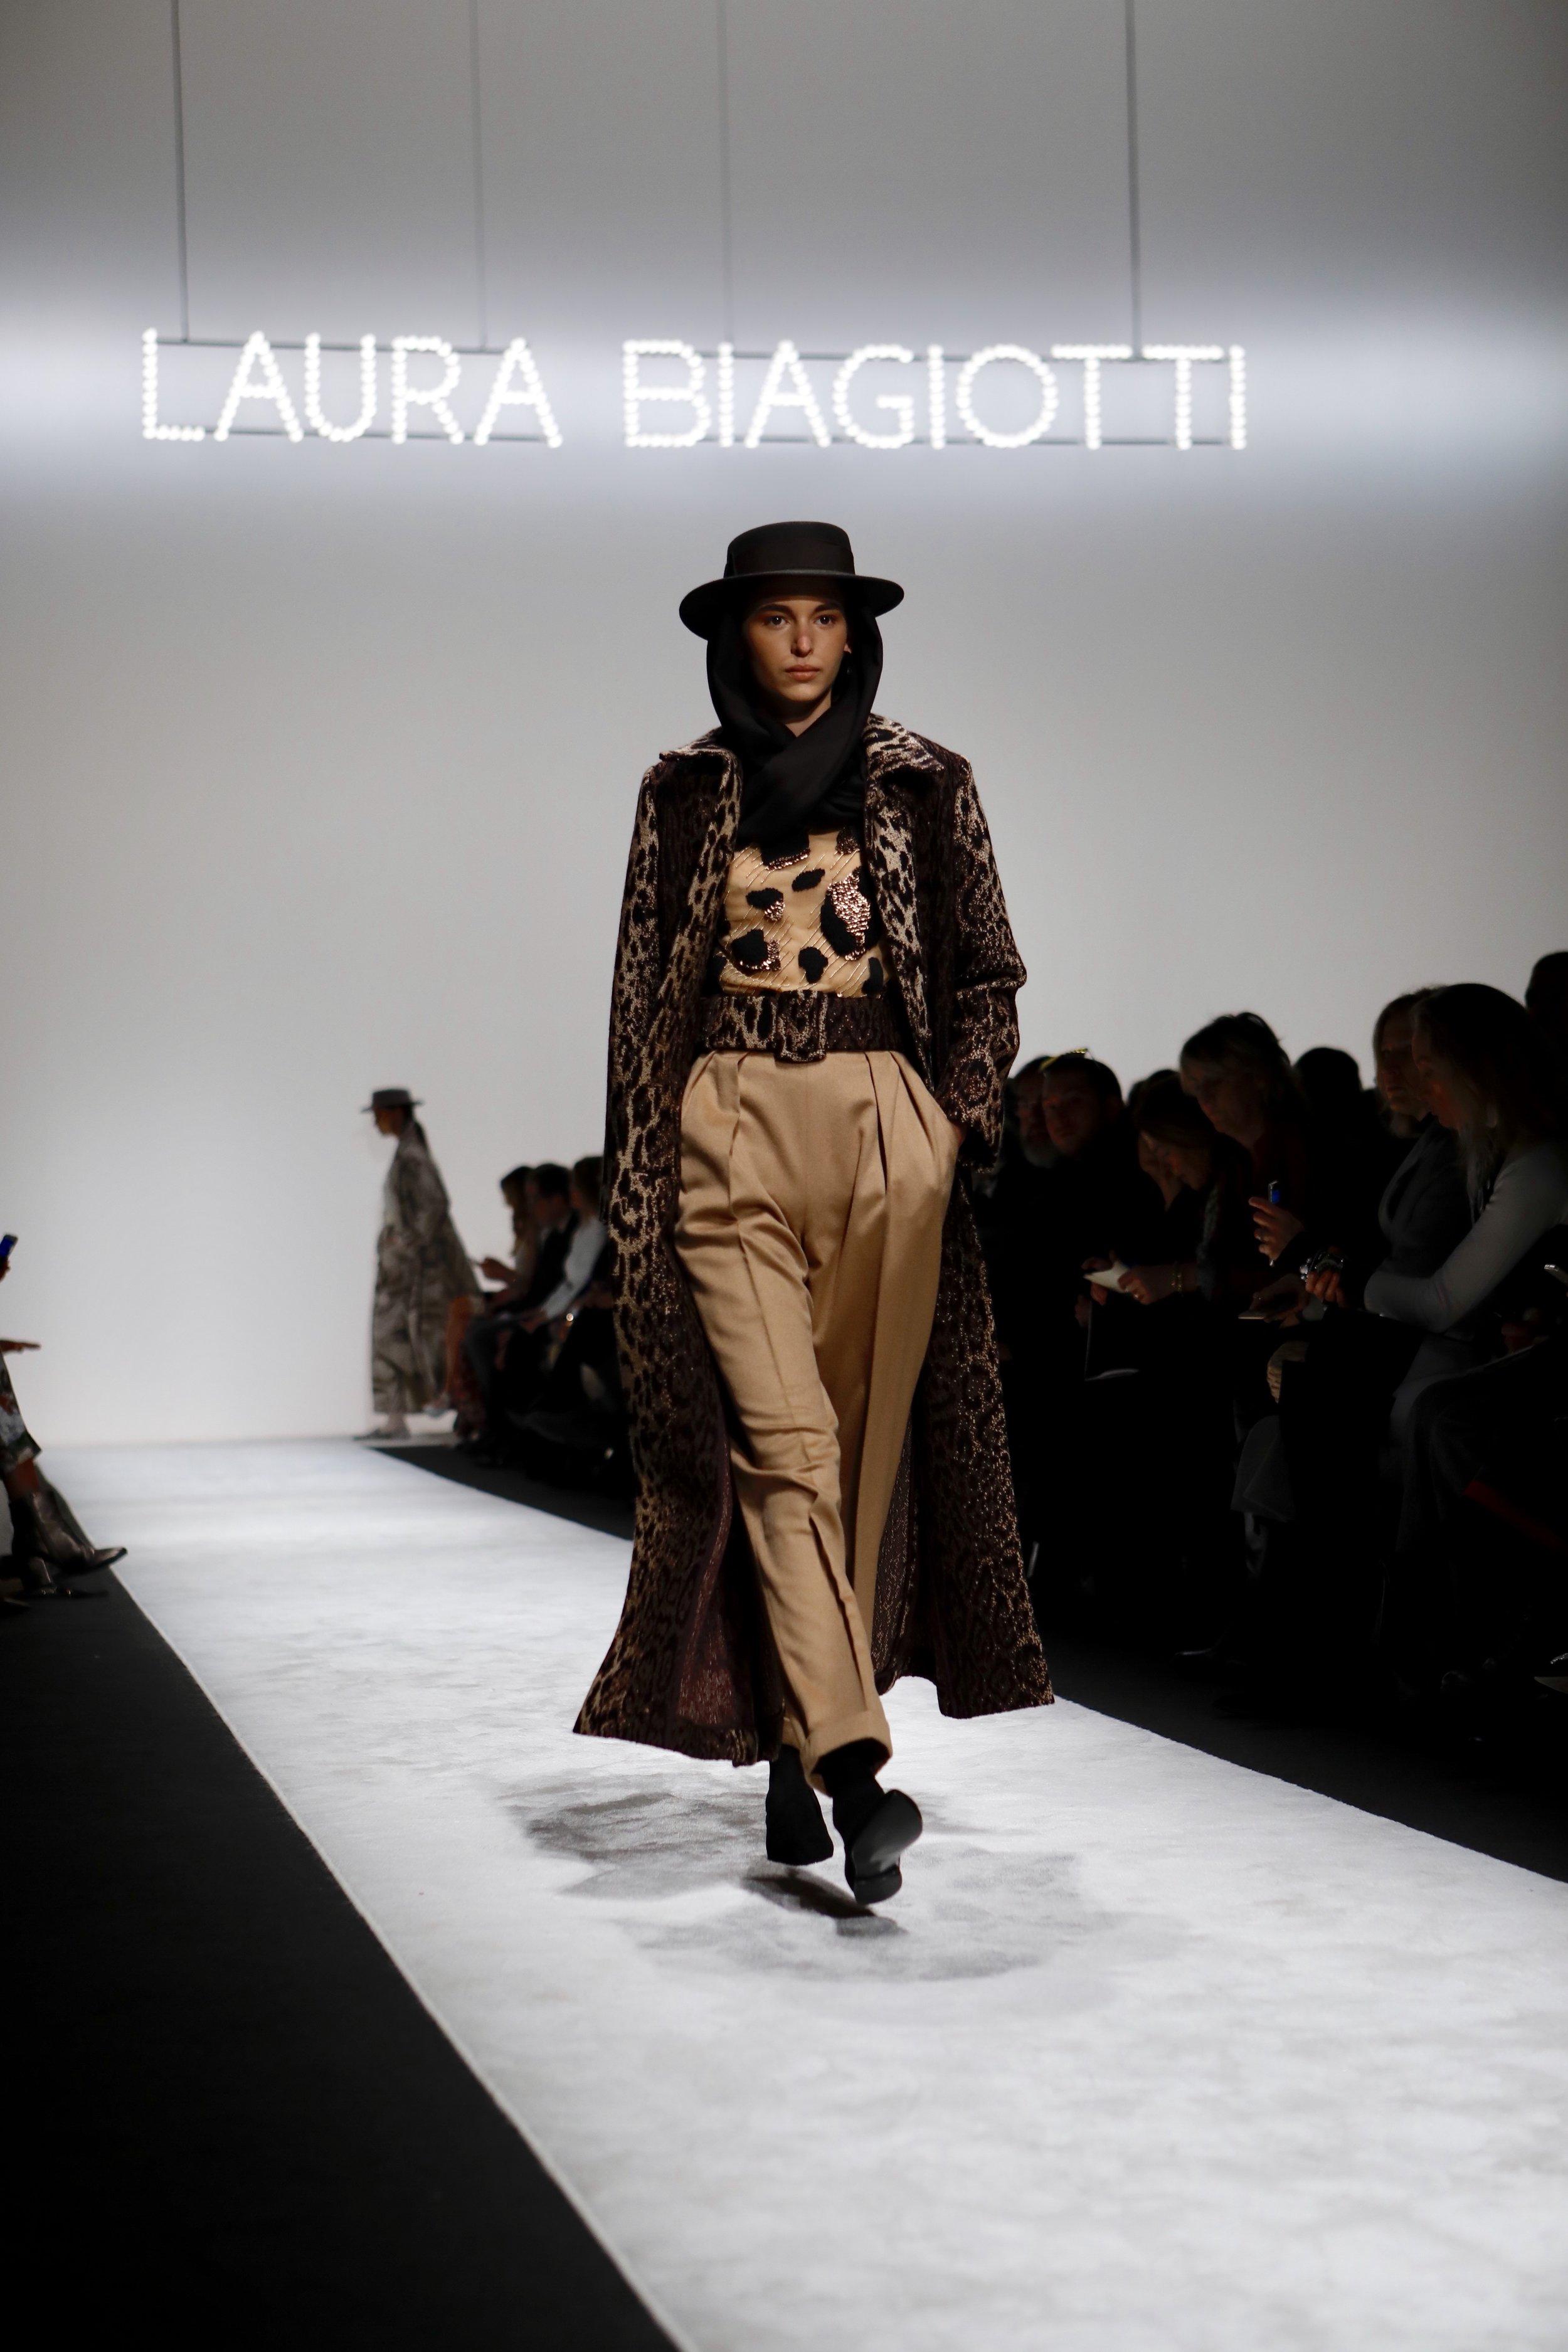 Laura Biagiotti by Giulia Rosatelli